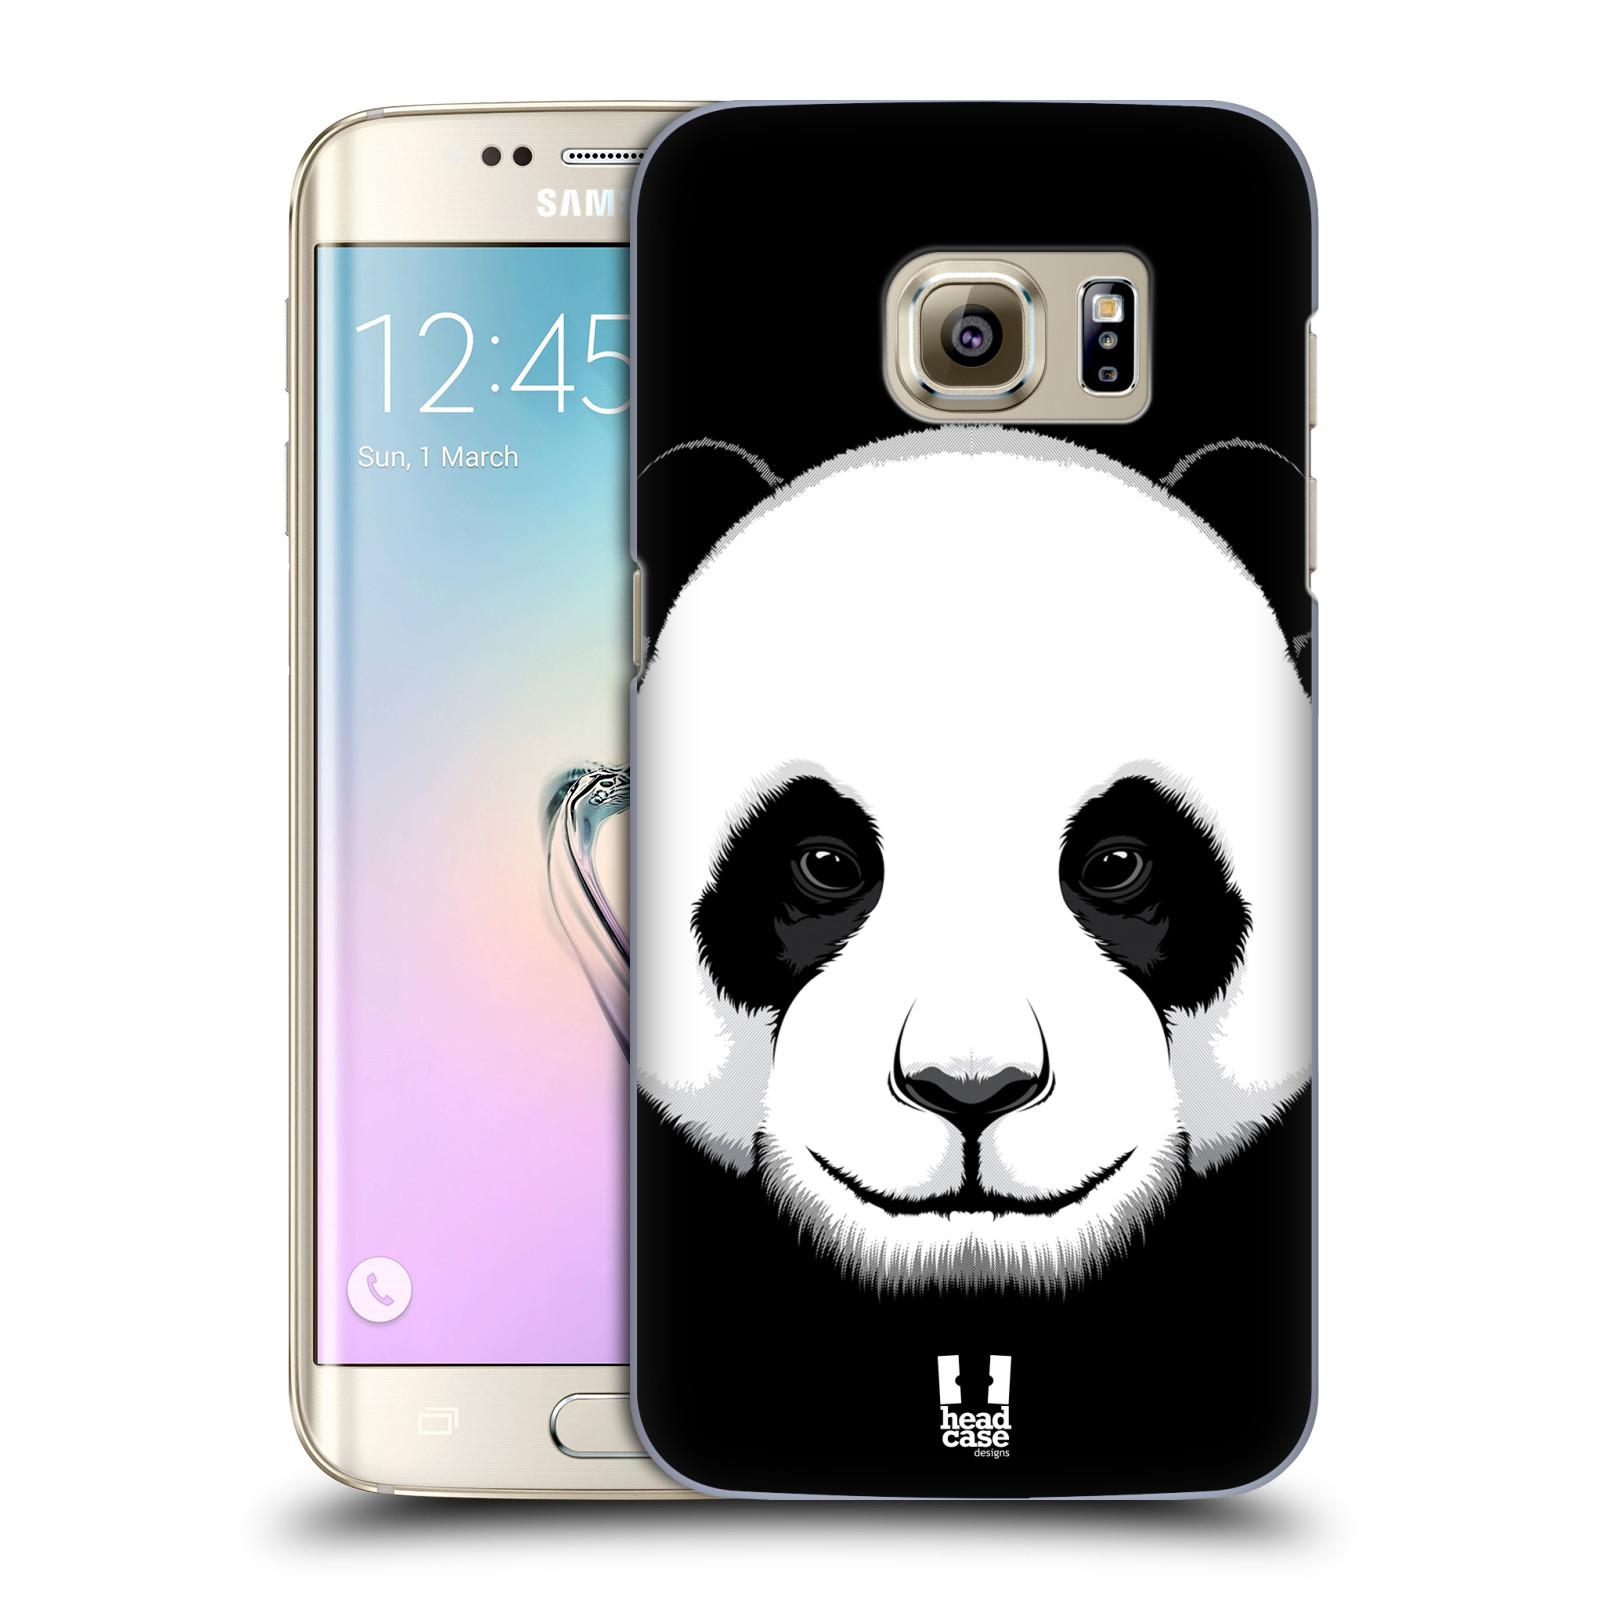 HEAD CASE plastový obal na mobil SAMSUNG GALAXY S7 EDGE vzor Zvíře kreslená tvář panda